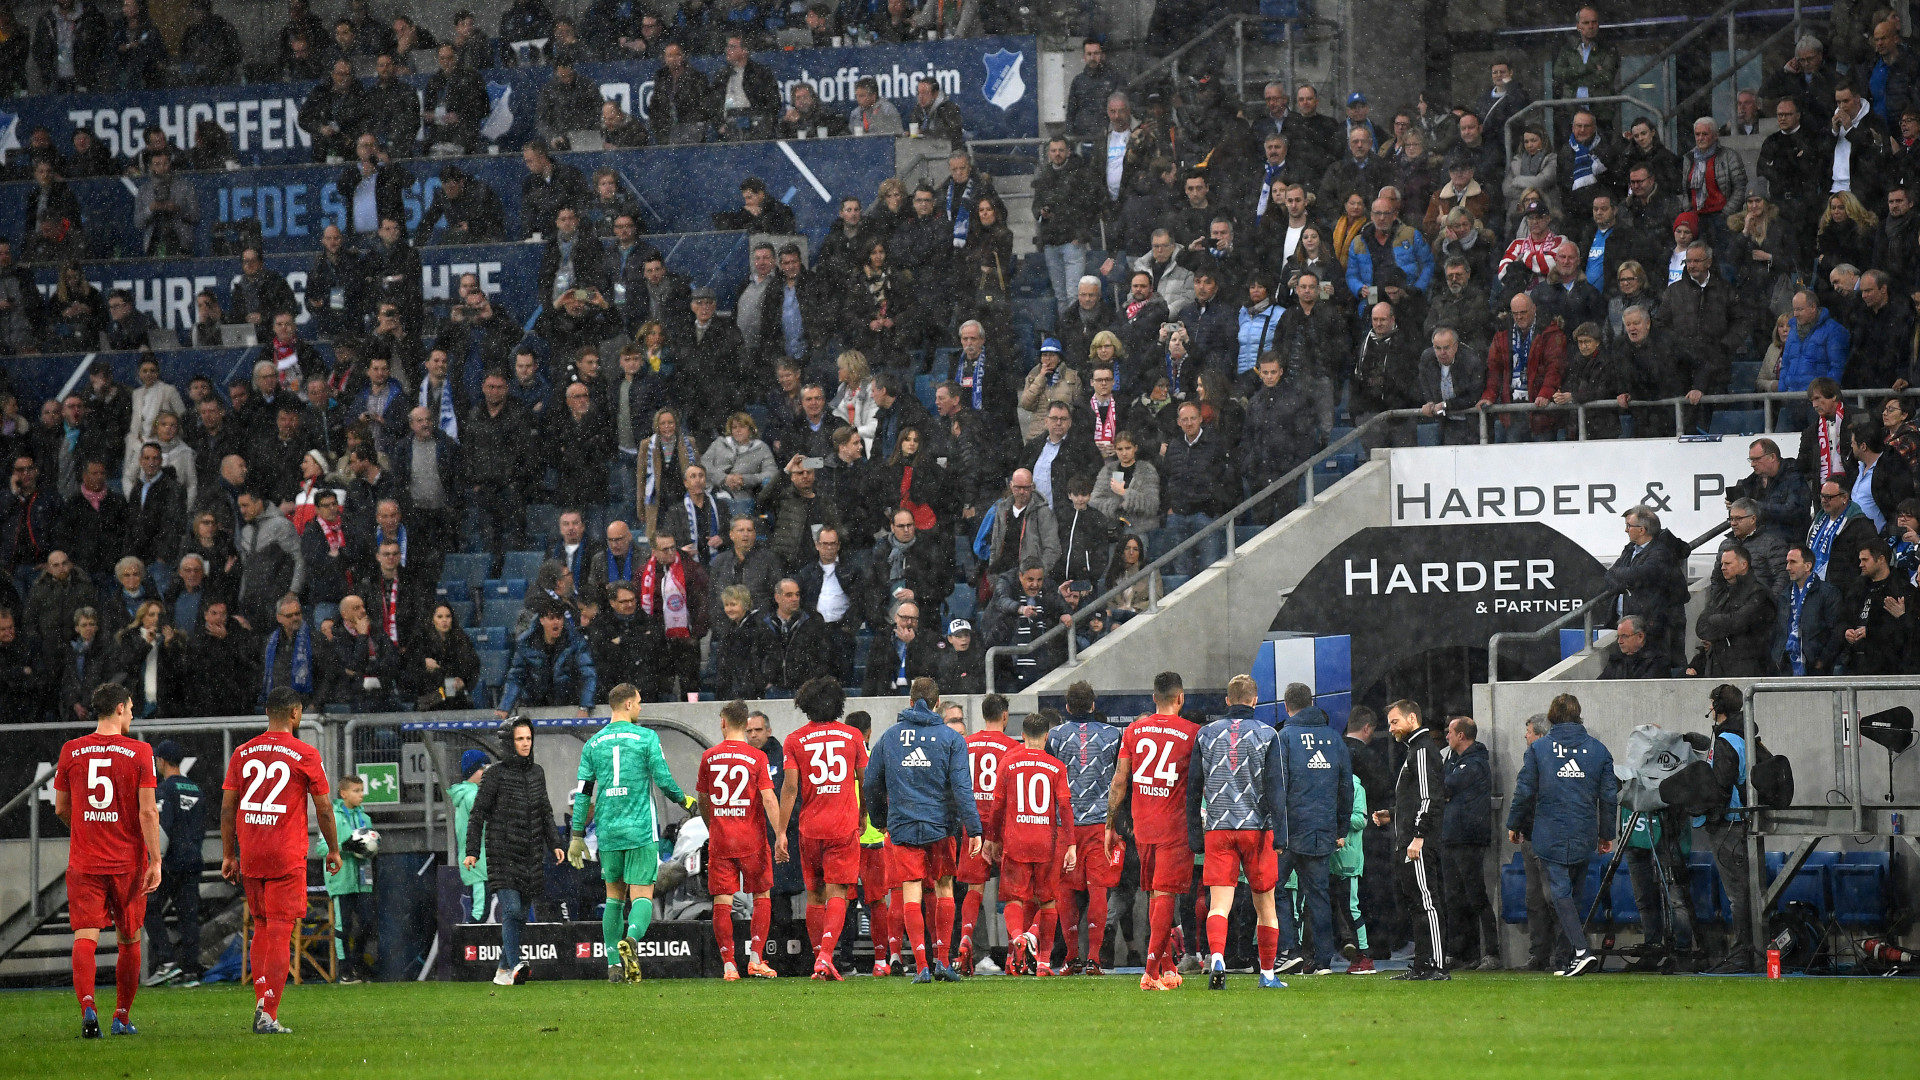 Allemagne - 24e journée - Hoffenheim-Bayern interrompu en raison de banderoles